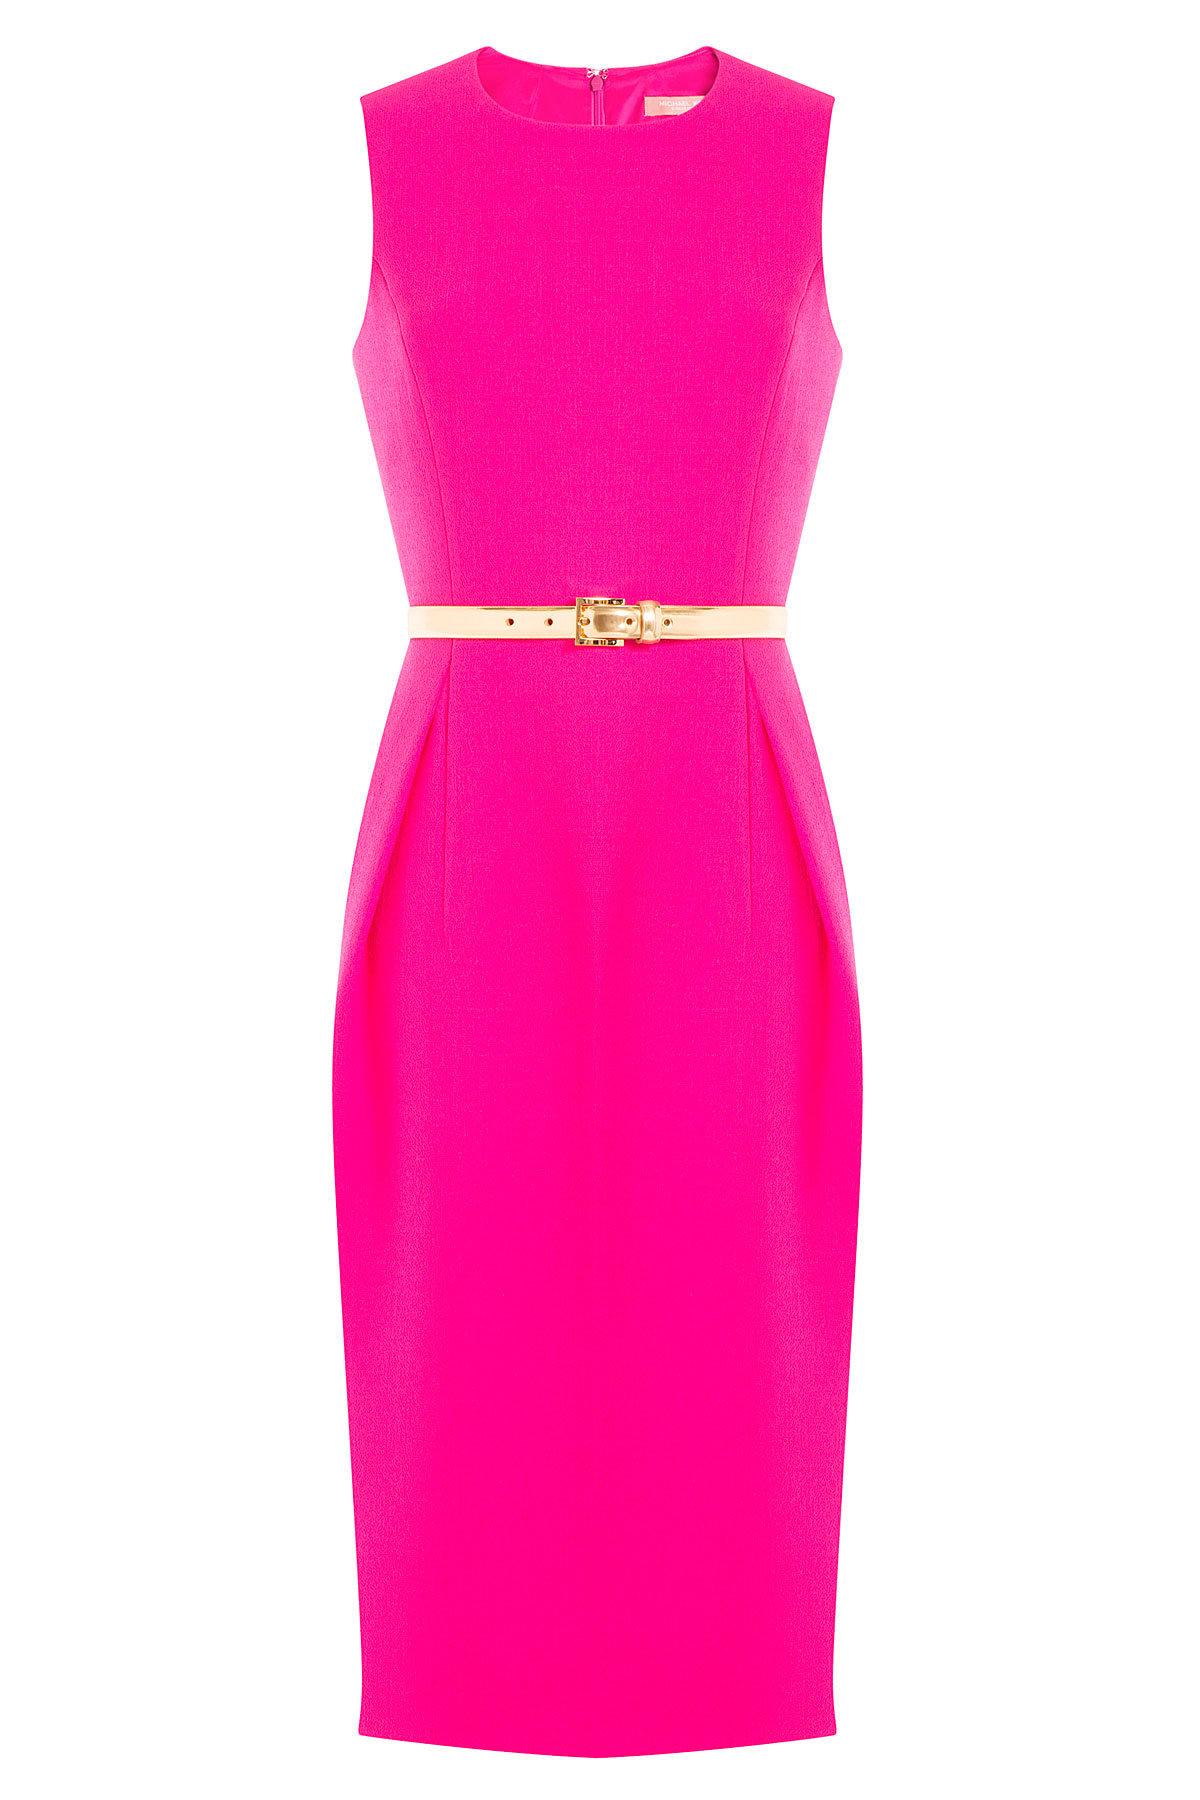 Michael Kors magenta Virgin Wool Dress with gold Belt